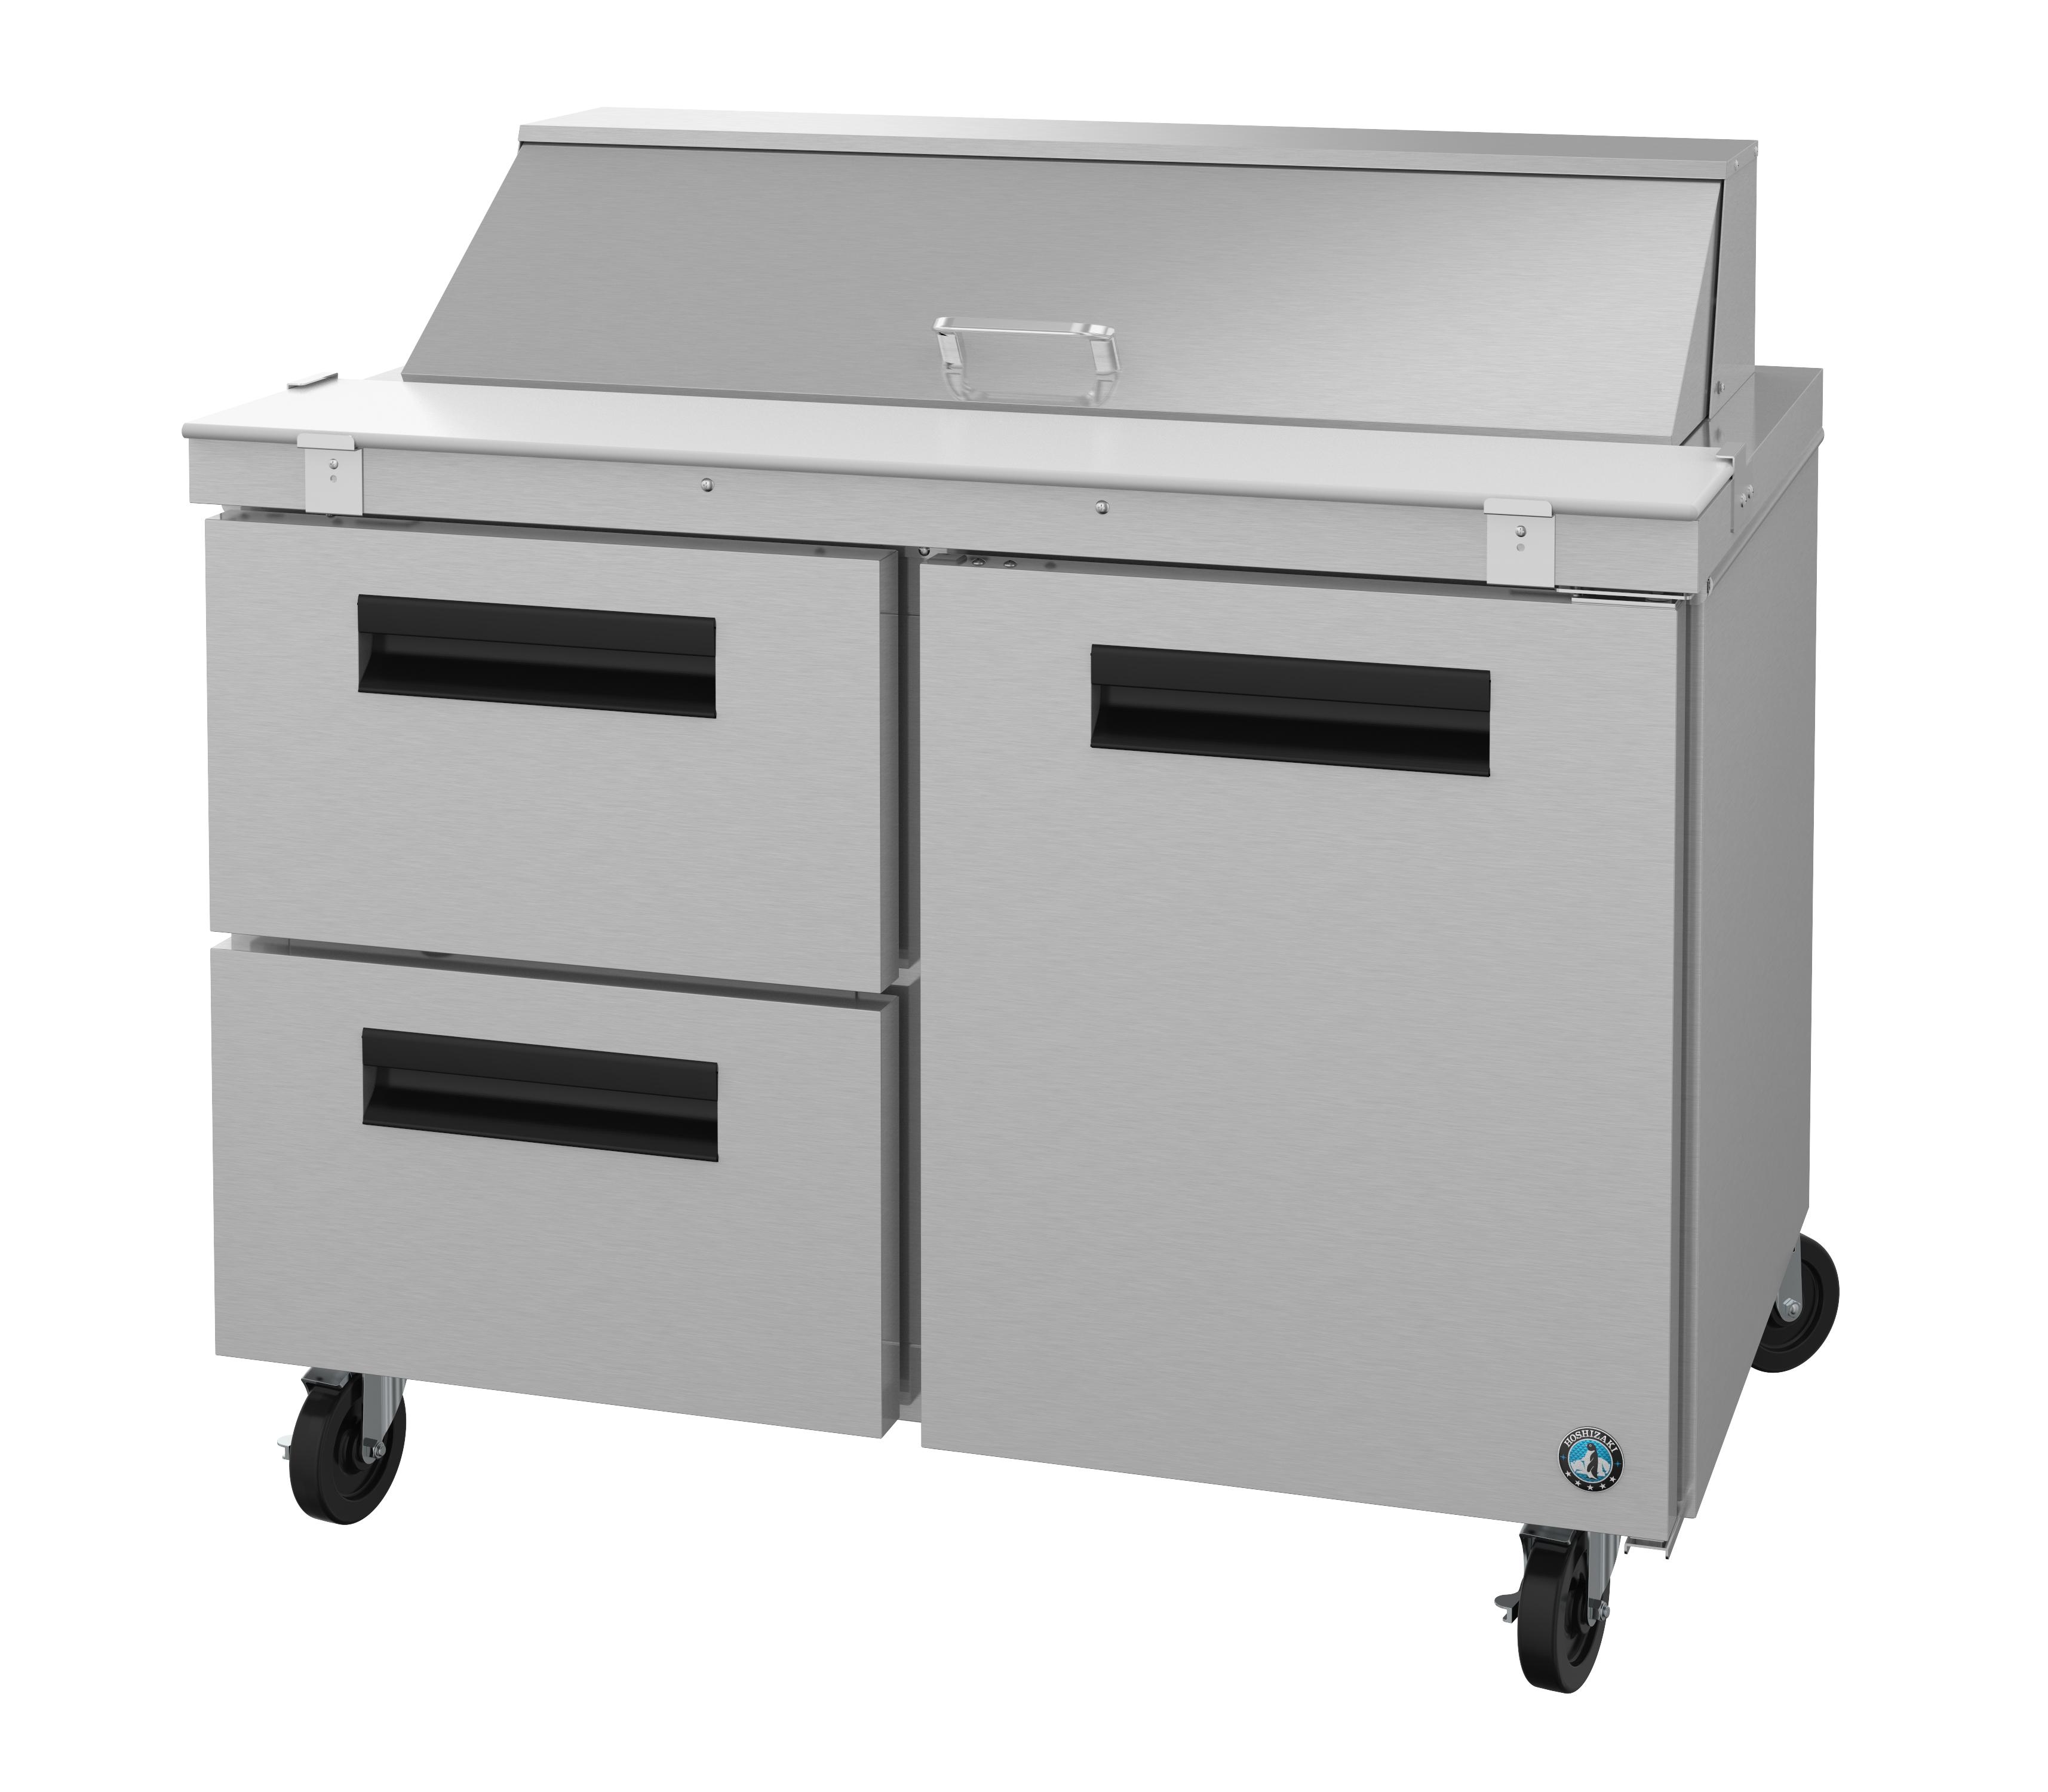 CRMR48-12D2-173x150 Product Release: Door/Drawer Combo - Sandwich Prep & Mega Top Prep Tables